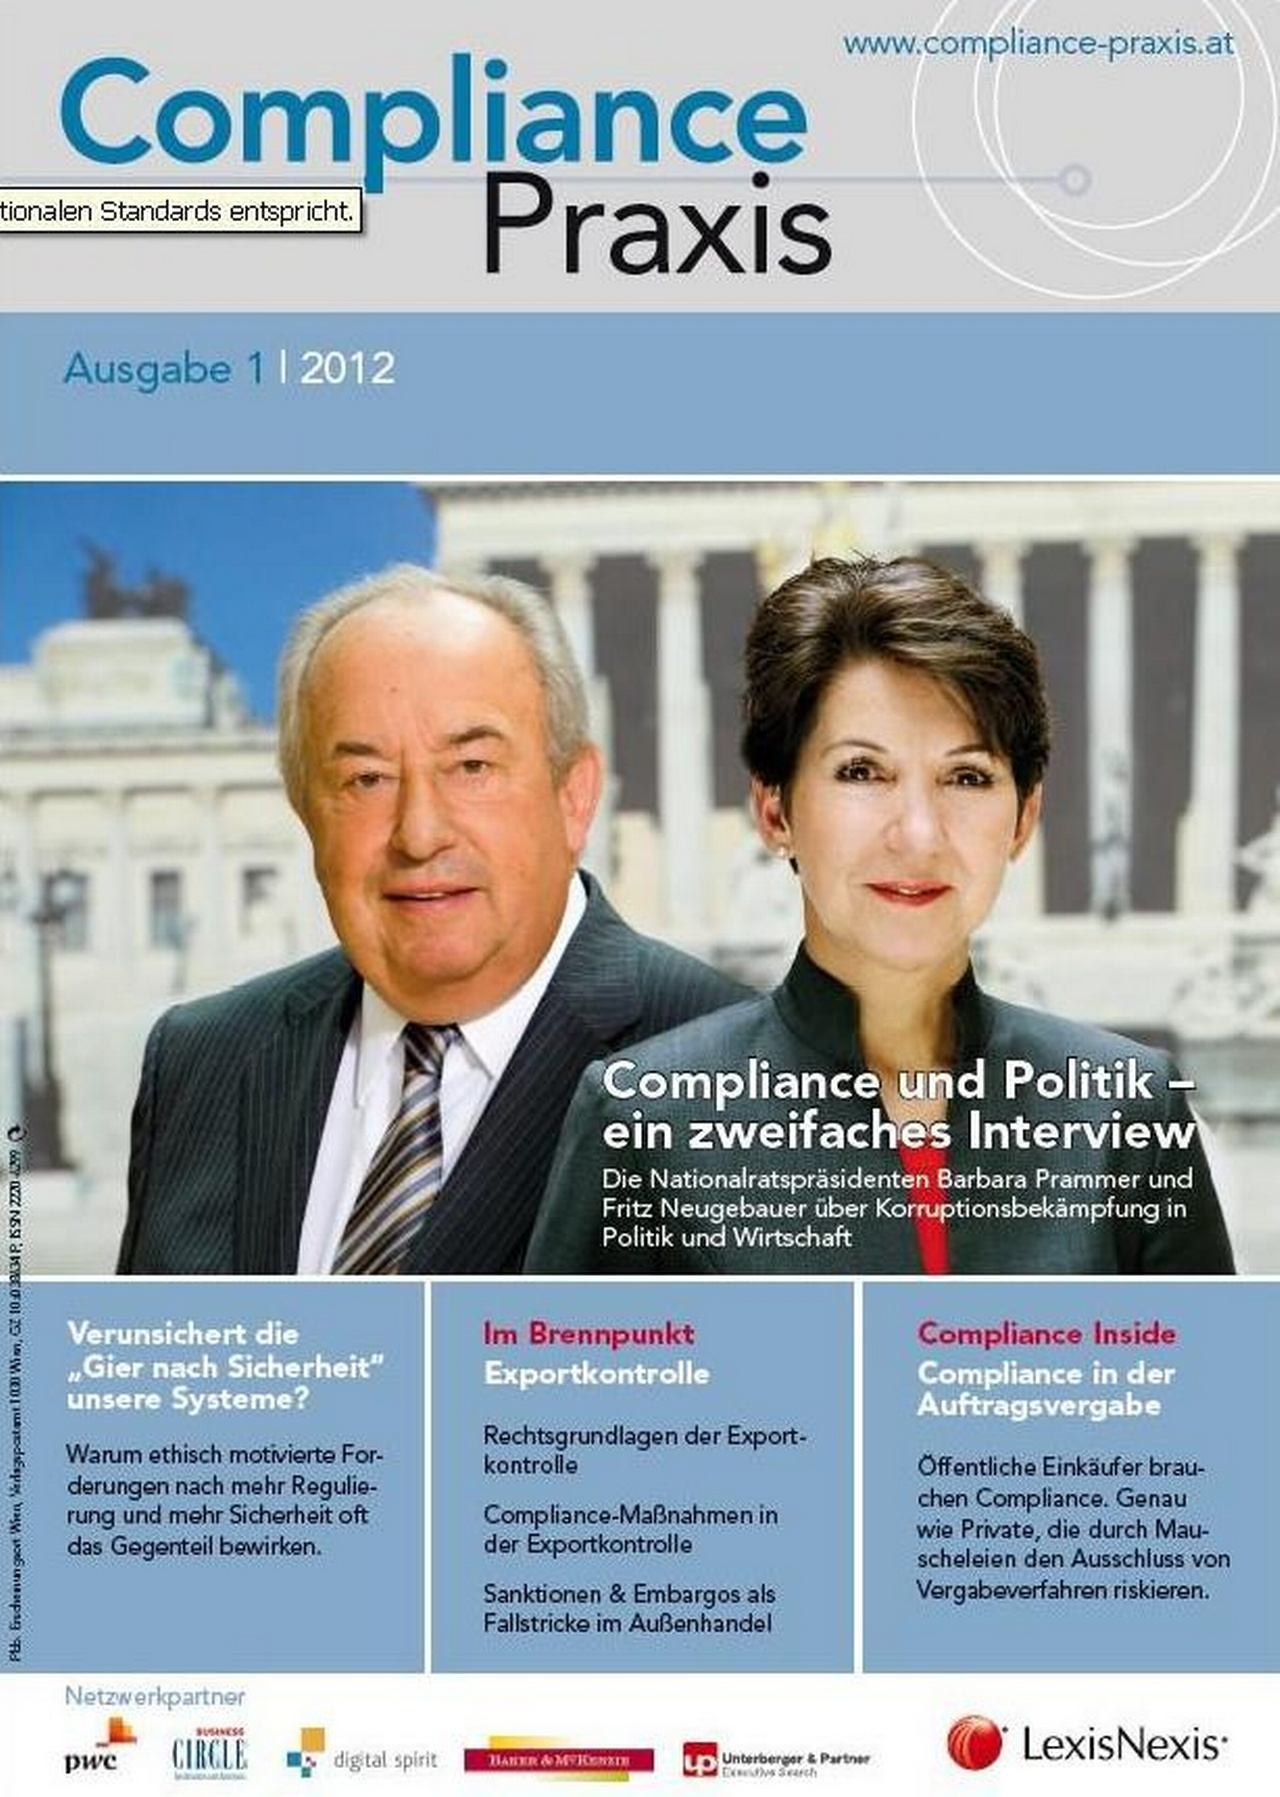 Cover von Compliance Praxis Ausgabe 1/2012, © LexisNexis